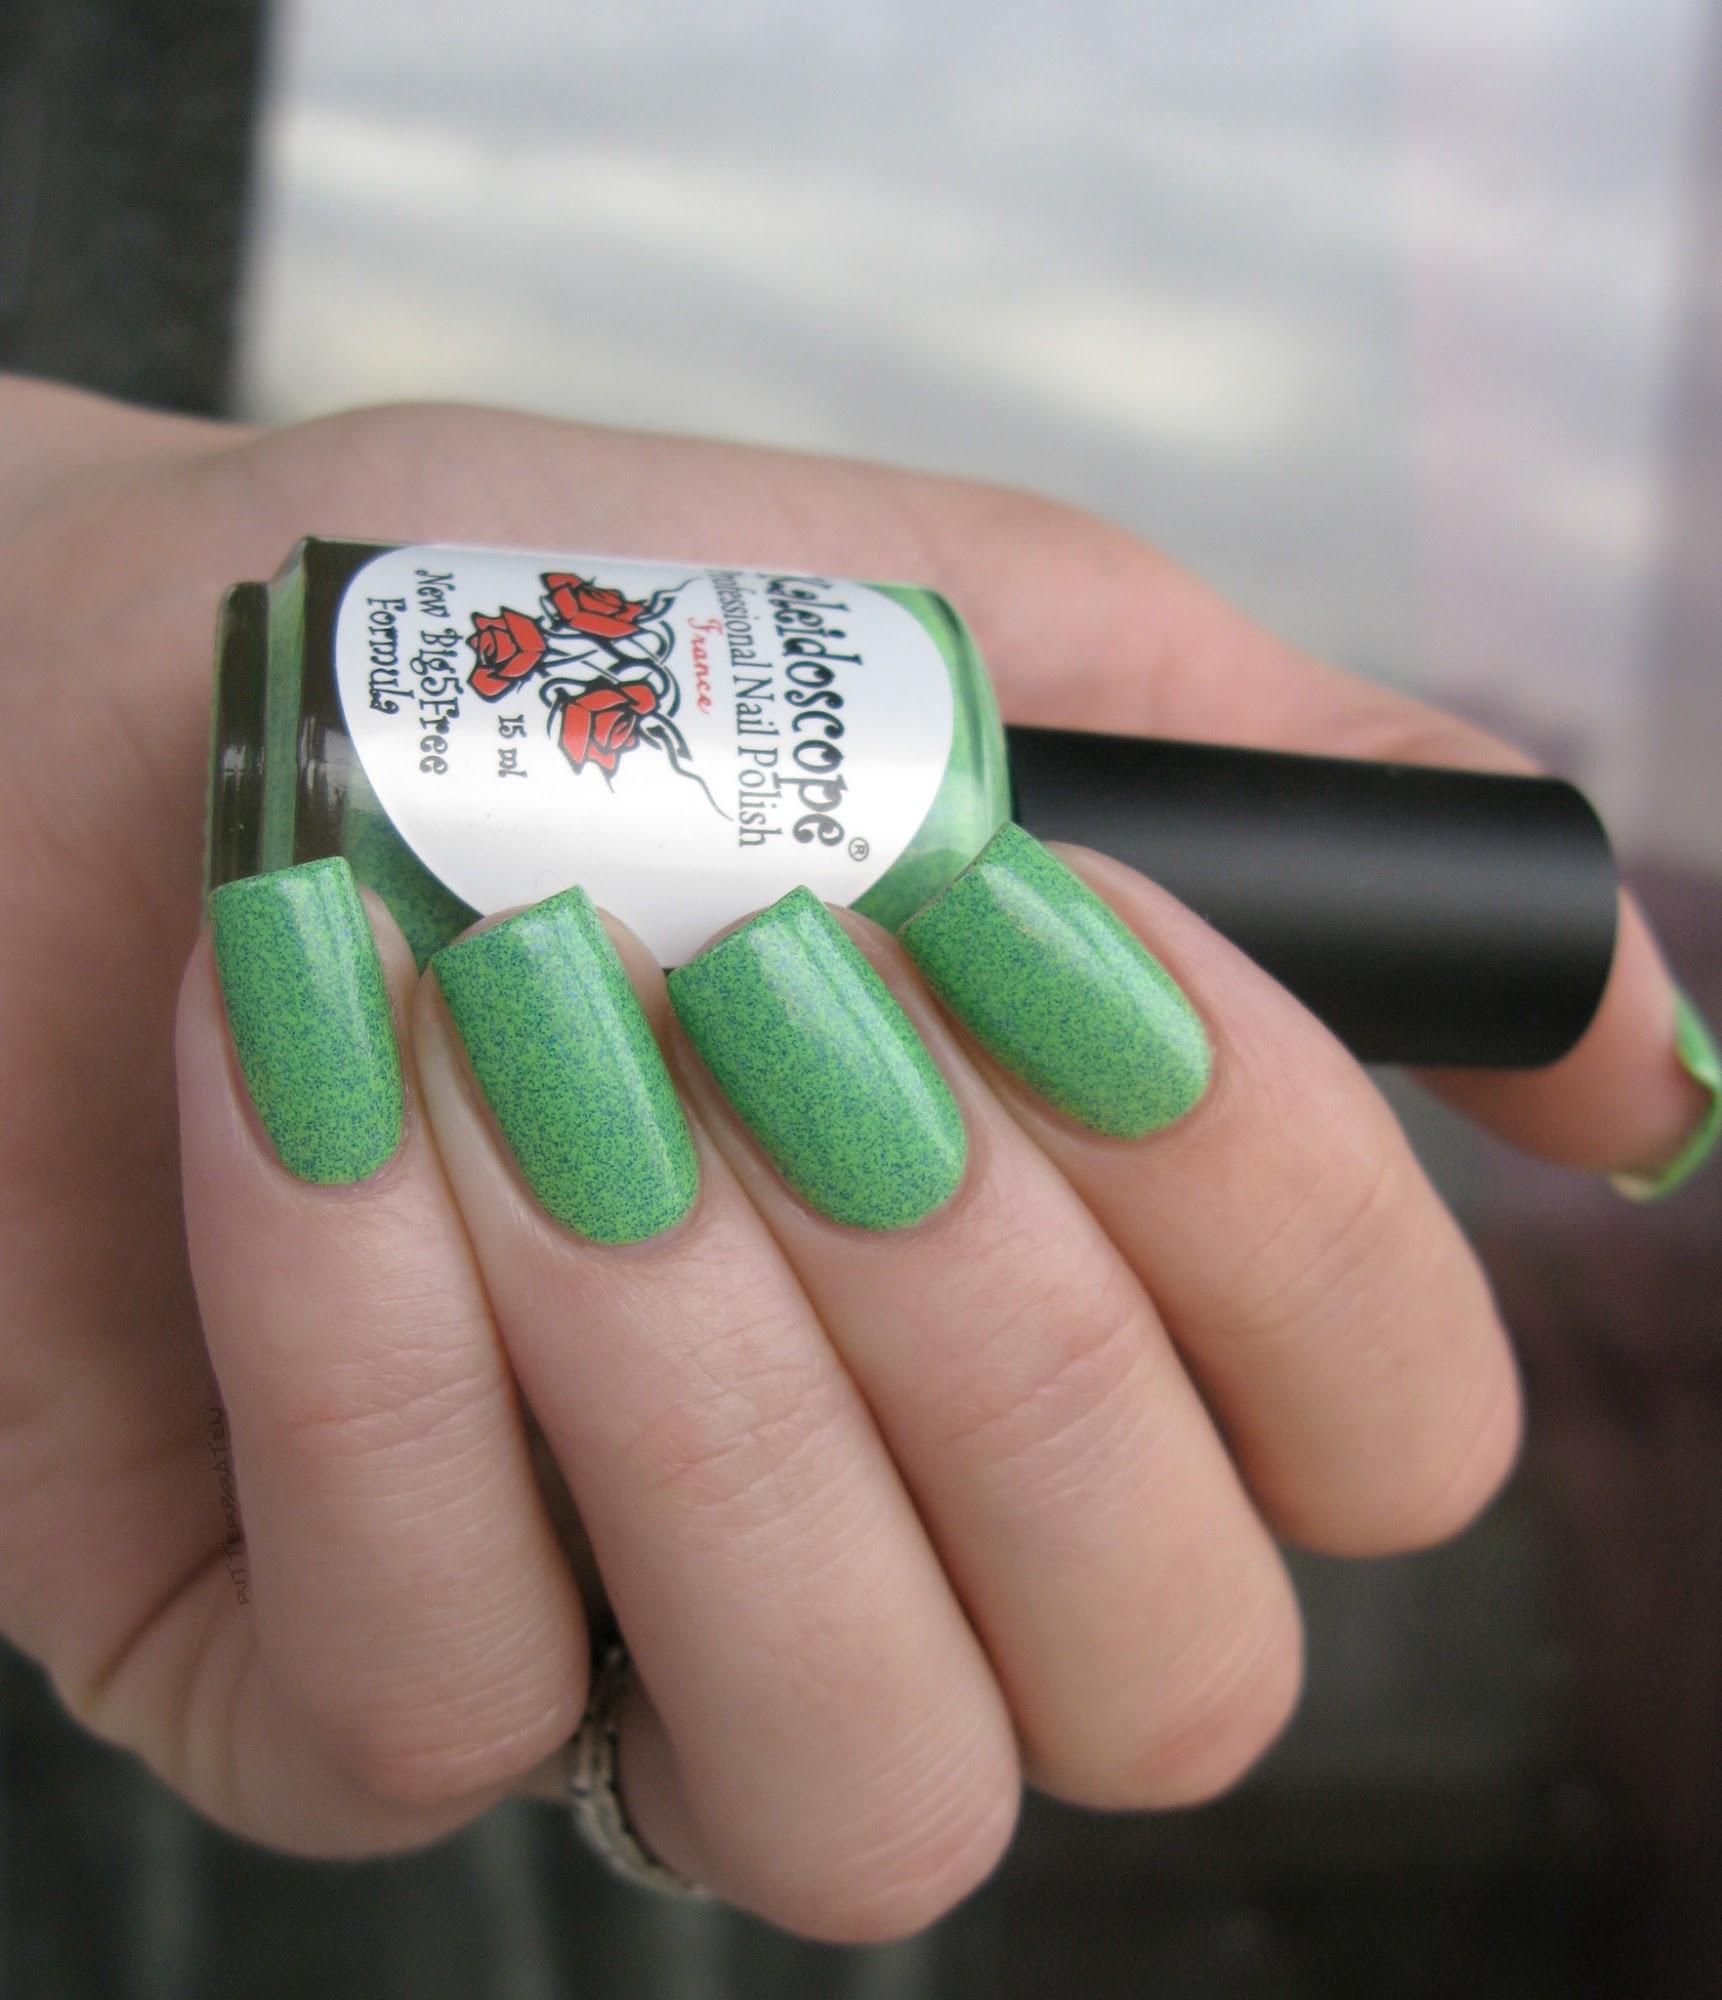 El Corazon травка зеленеет солнышко блестит